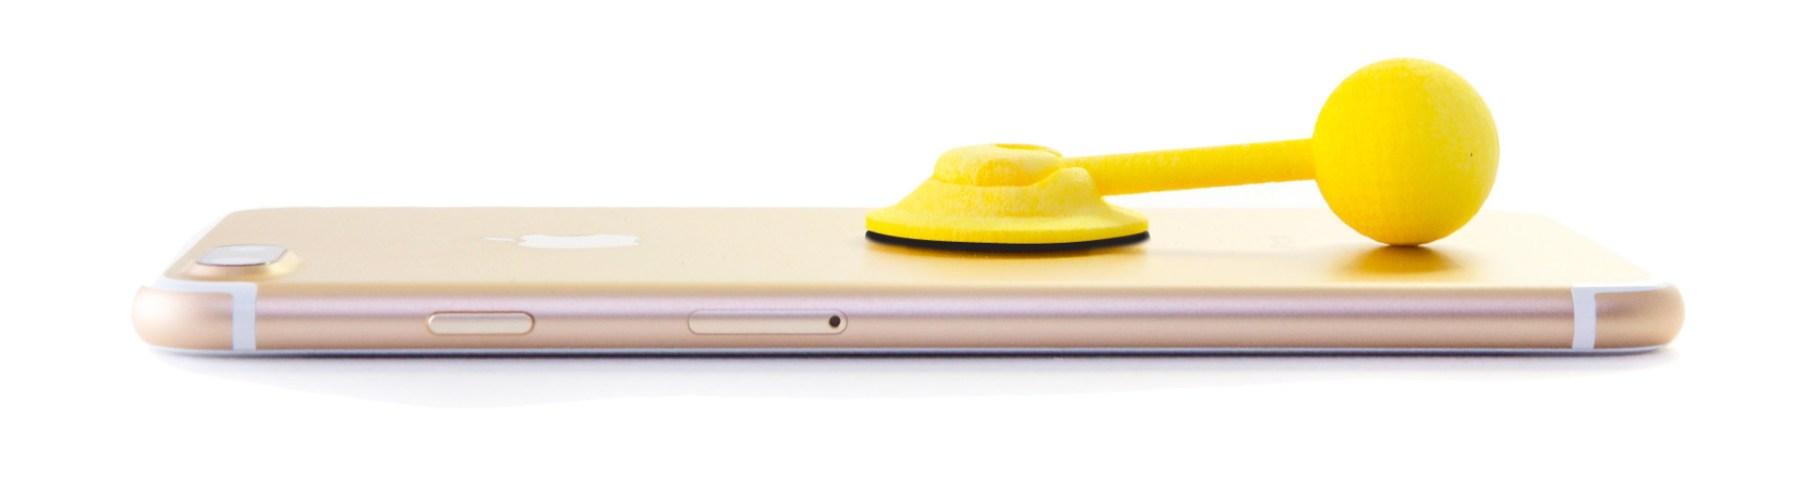 JOYSTICK-PHONE-STAND-FLAT-3